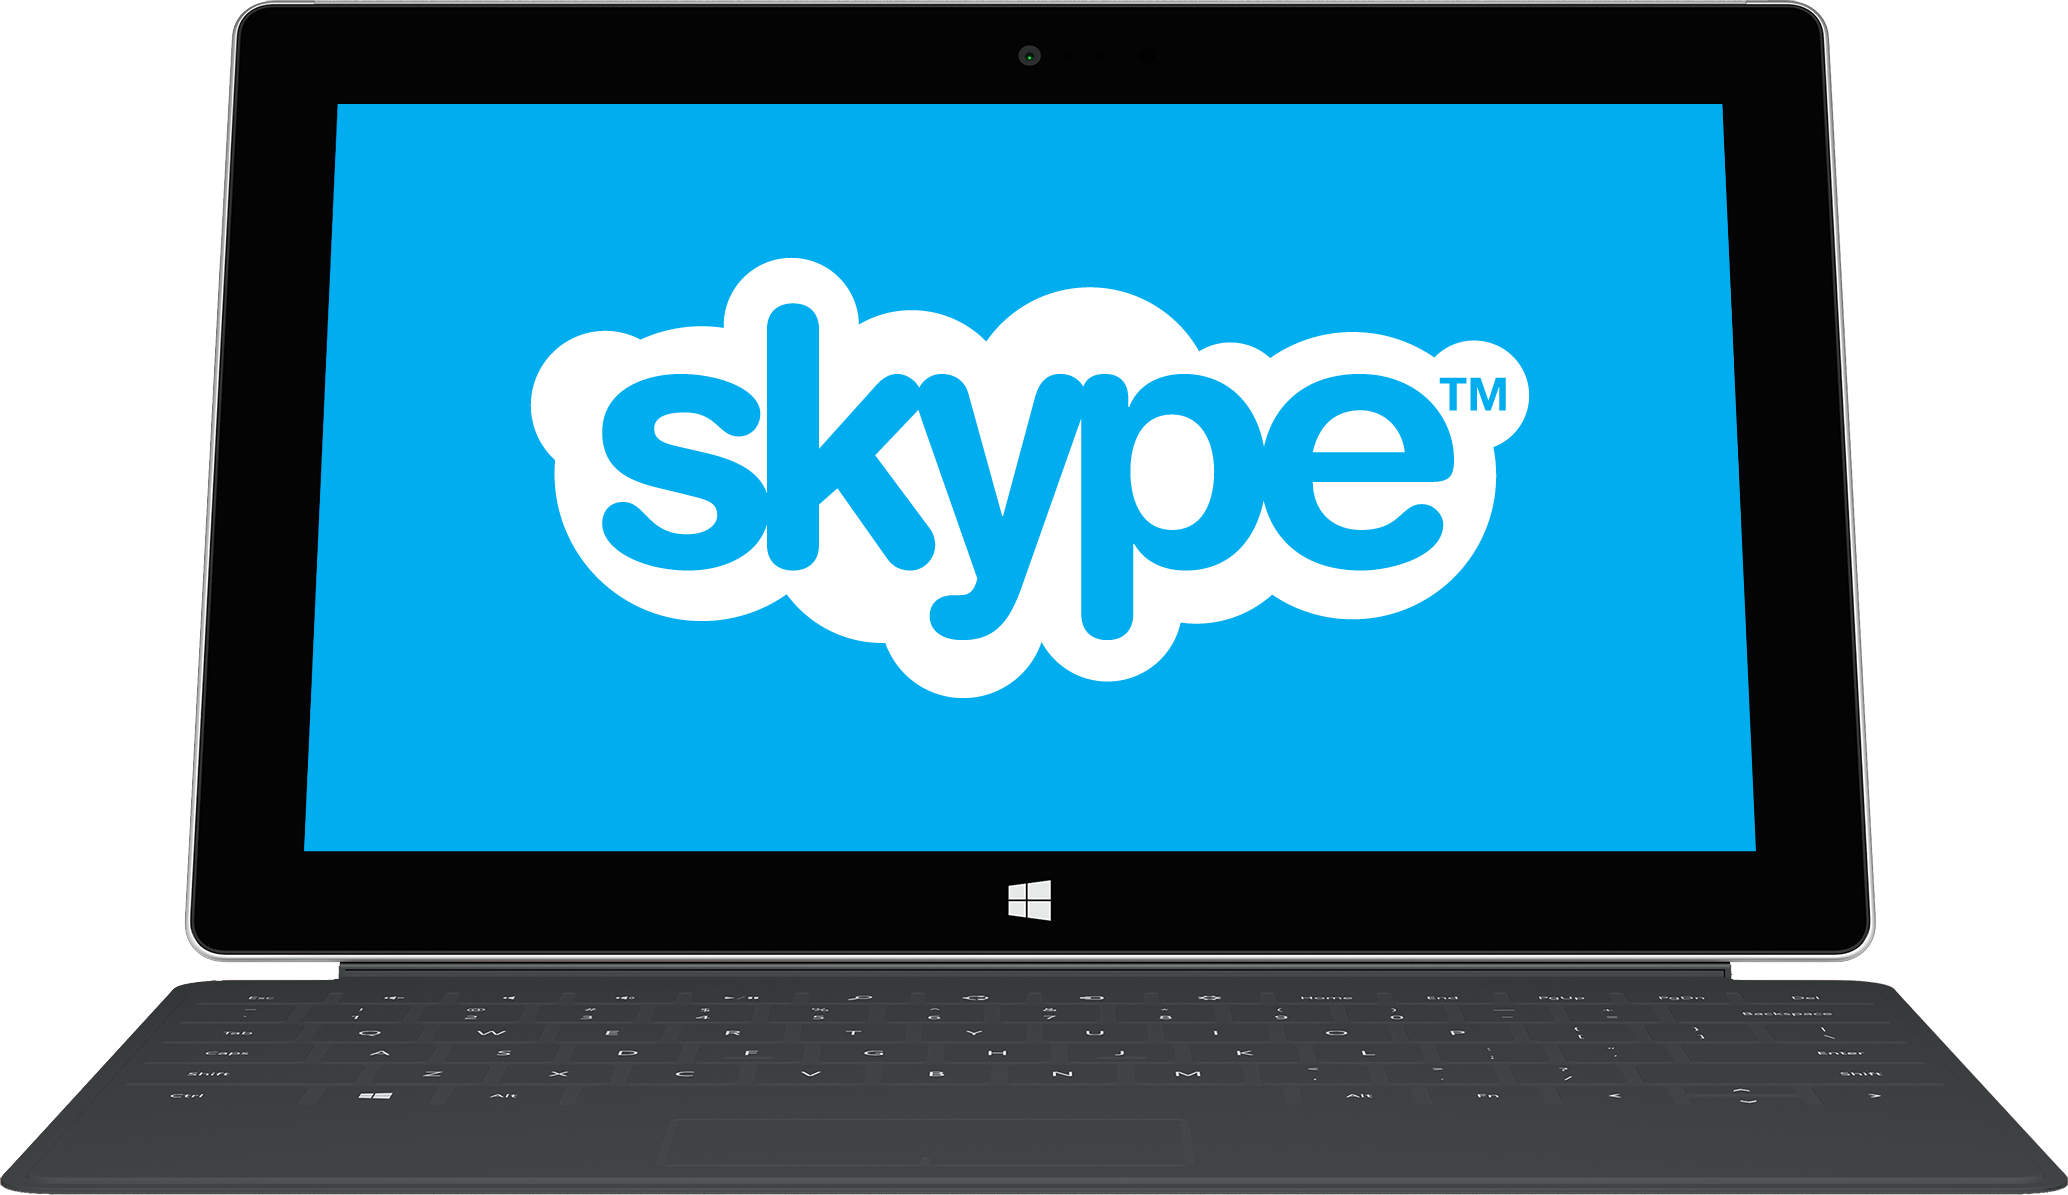 skype-surface